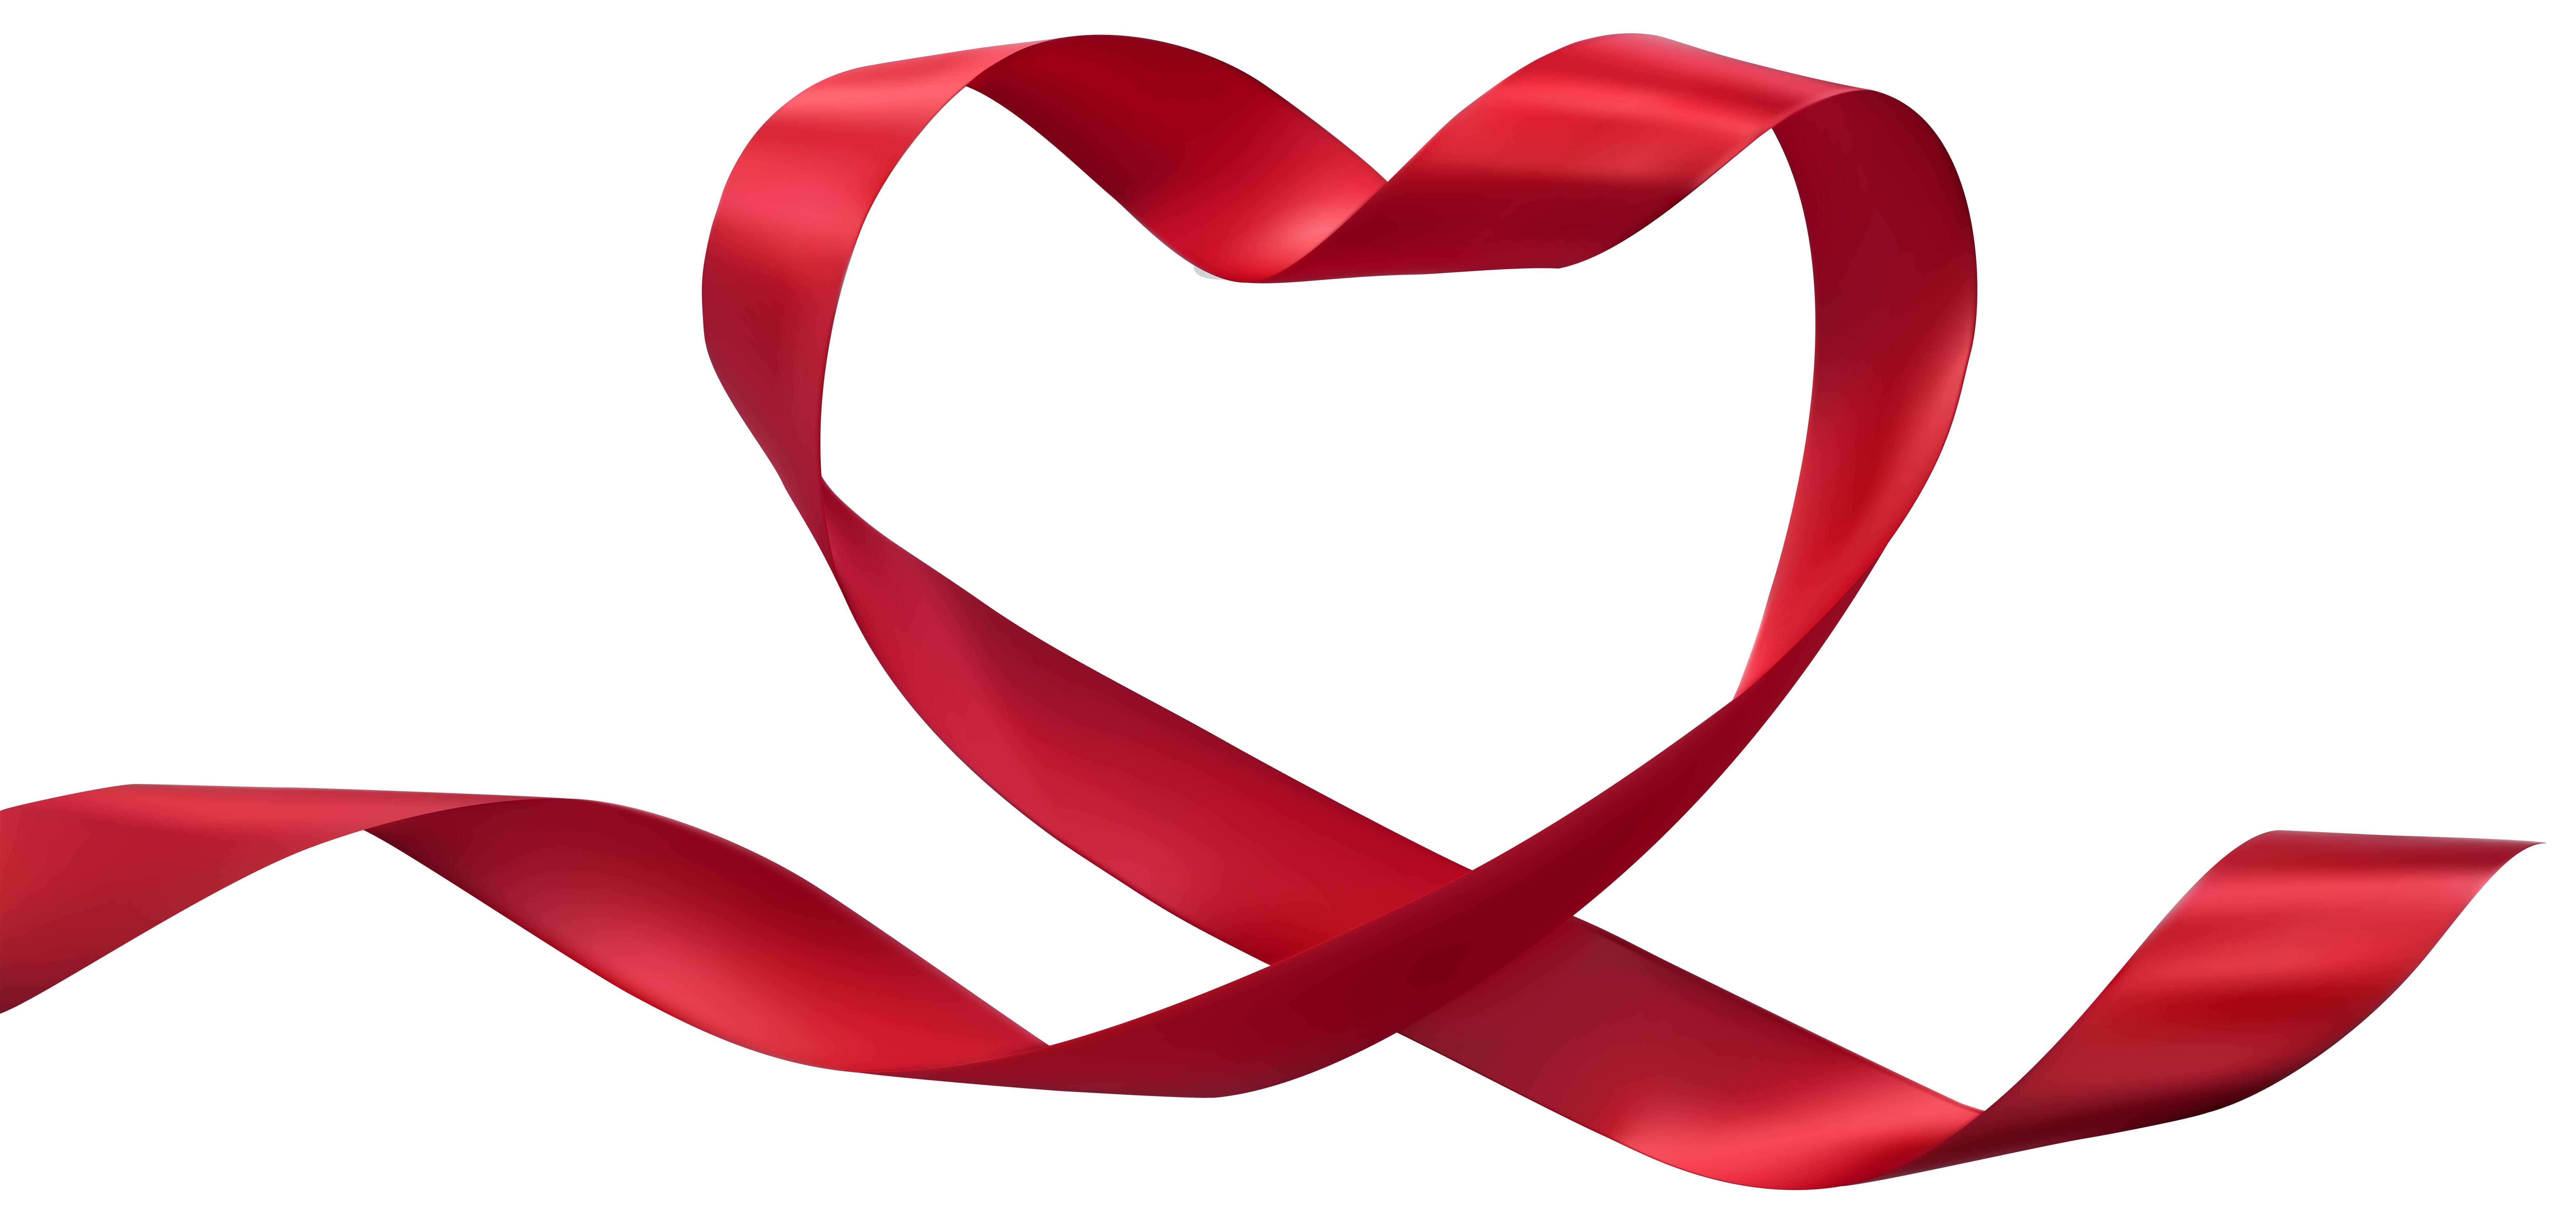 Heart Ribbon Transparent PNG Clip Art Image.